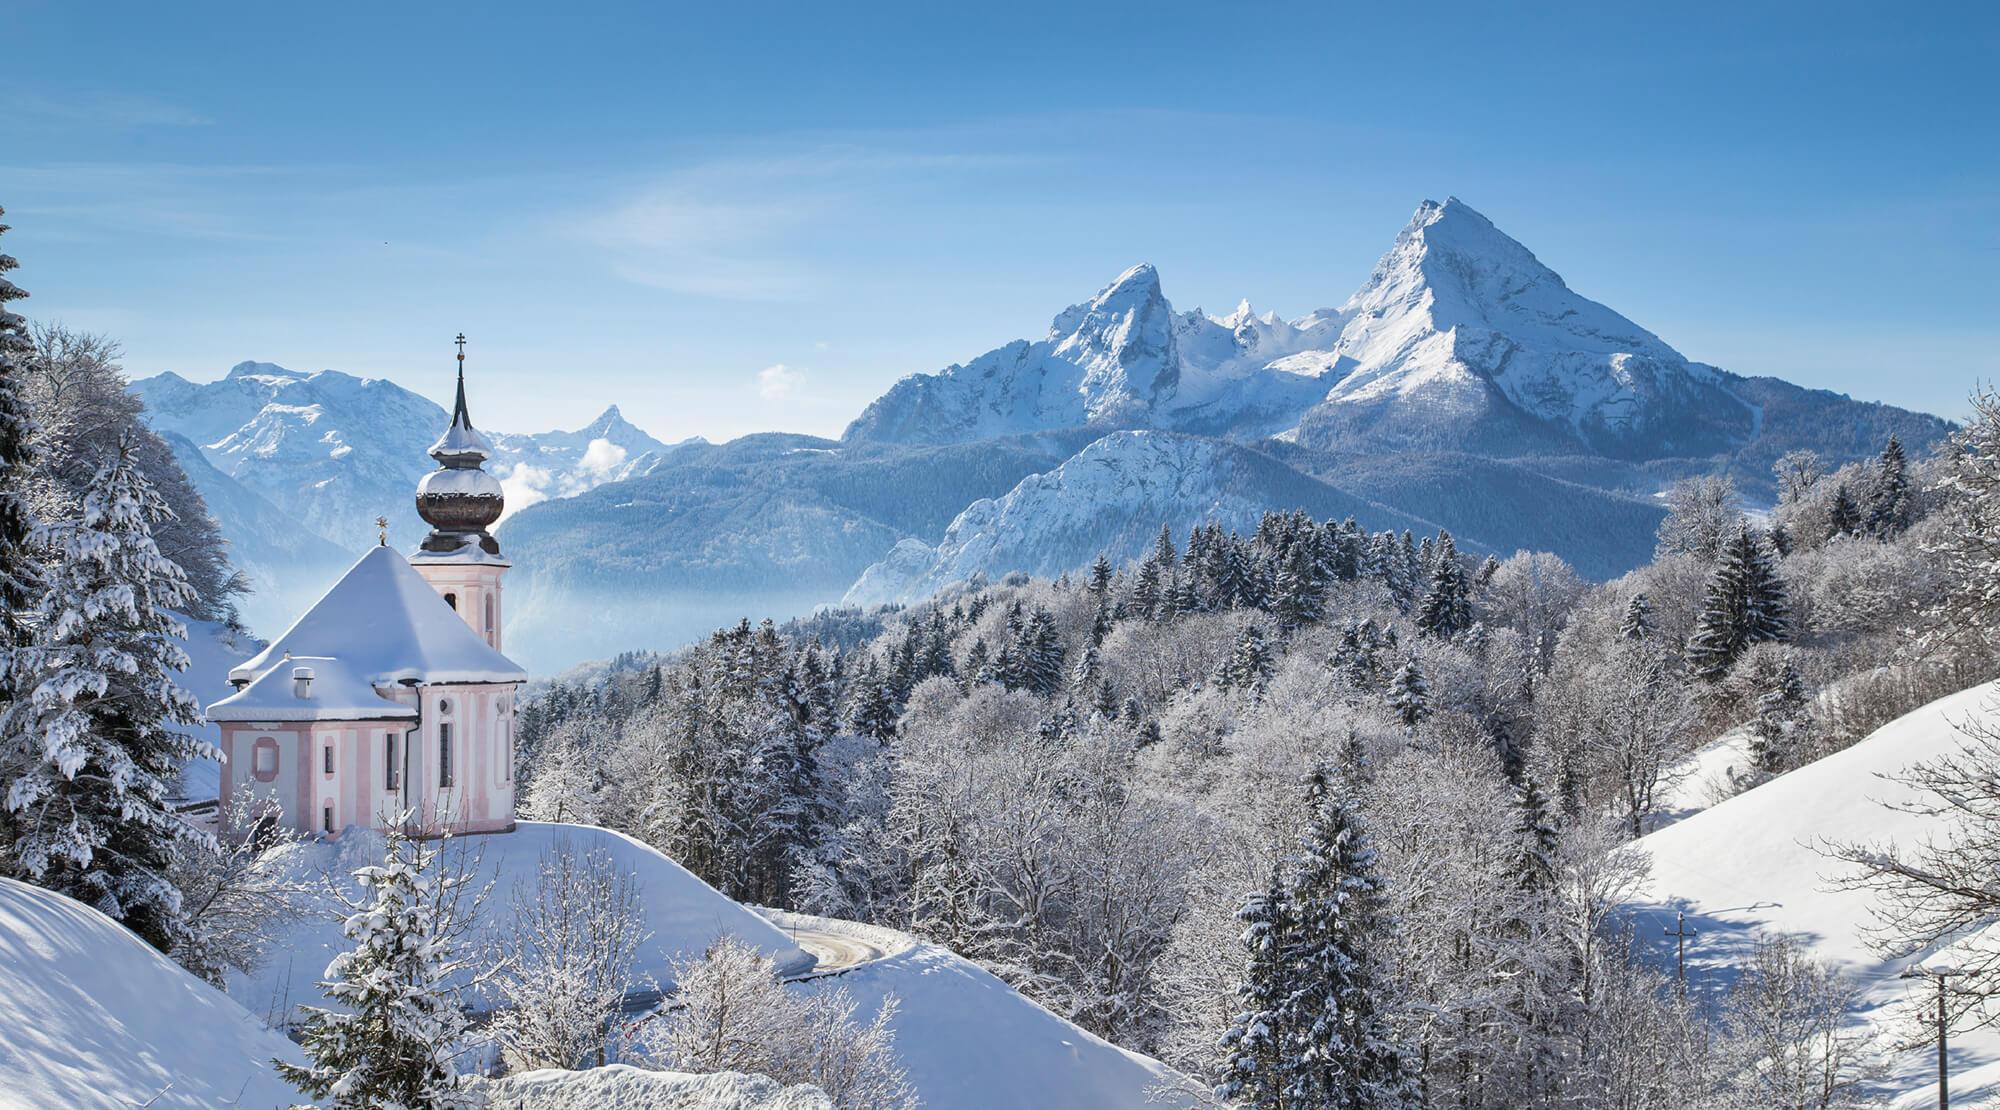 geöffnete alpen allgäu